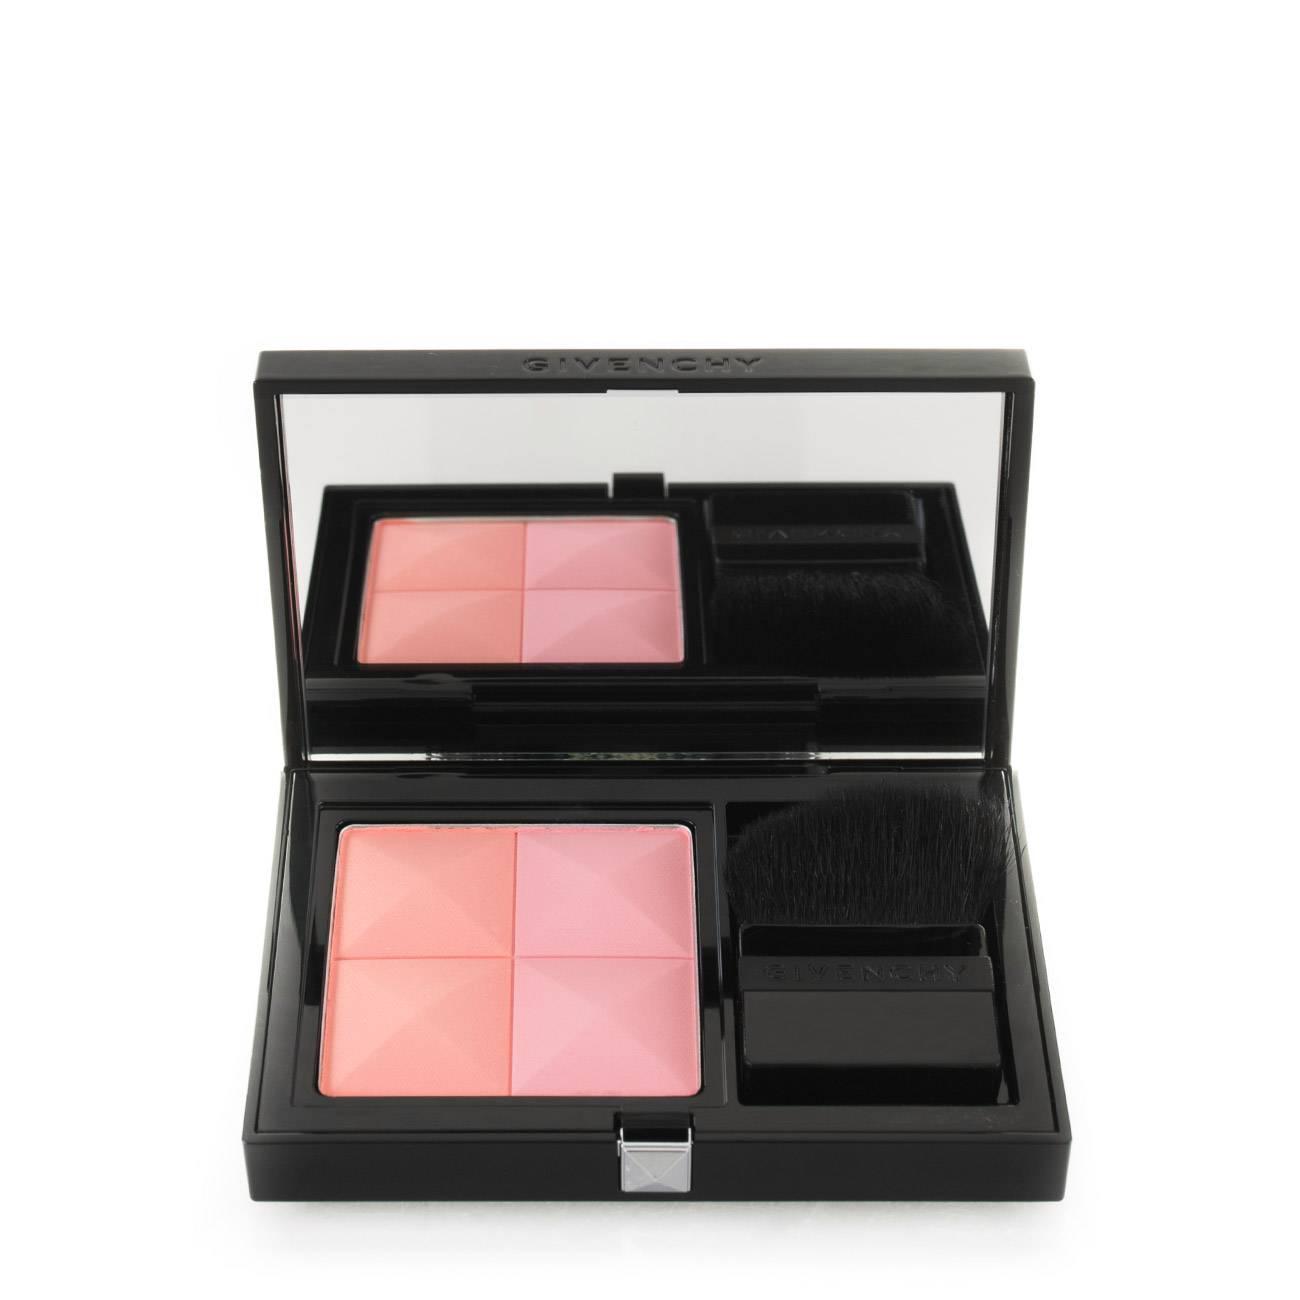 Le Prisme Blush Spice 03 Givenchy imagine 2021 bestvalue.eu